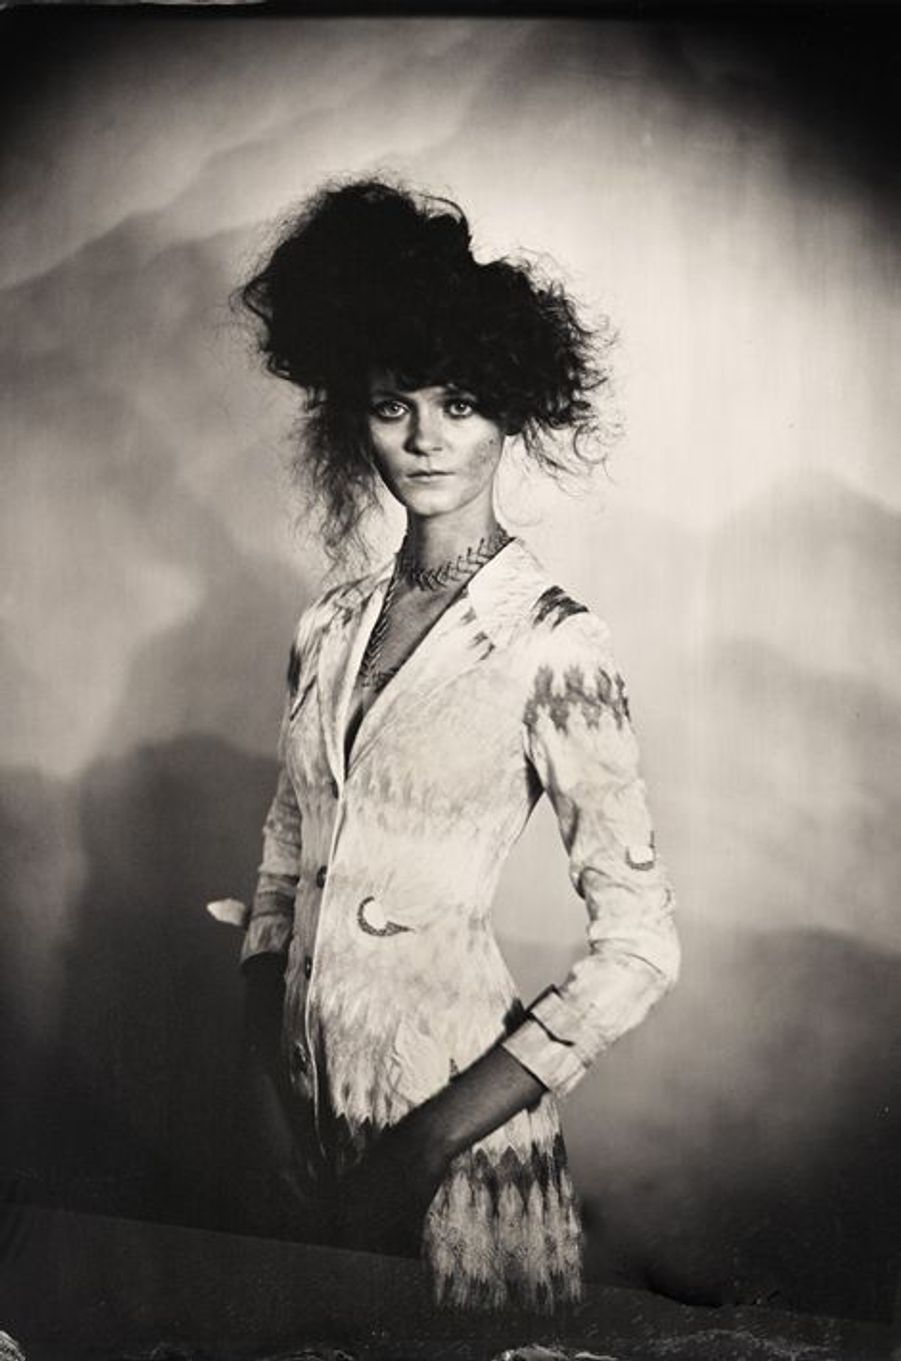 «Portrait de la top model Joanna Prztula habillée Missoni. Stylisme par Cynthia Altoriso, maquillage par Cheyenne Timperio, coiffure par Yasutaké Kosaka. 2015»